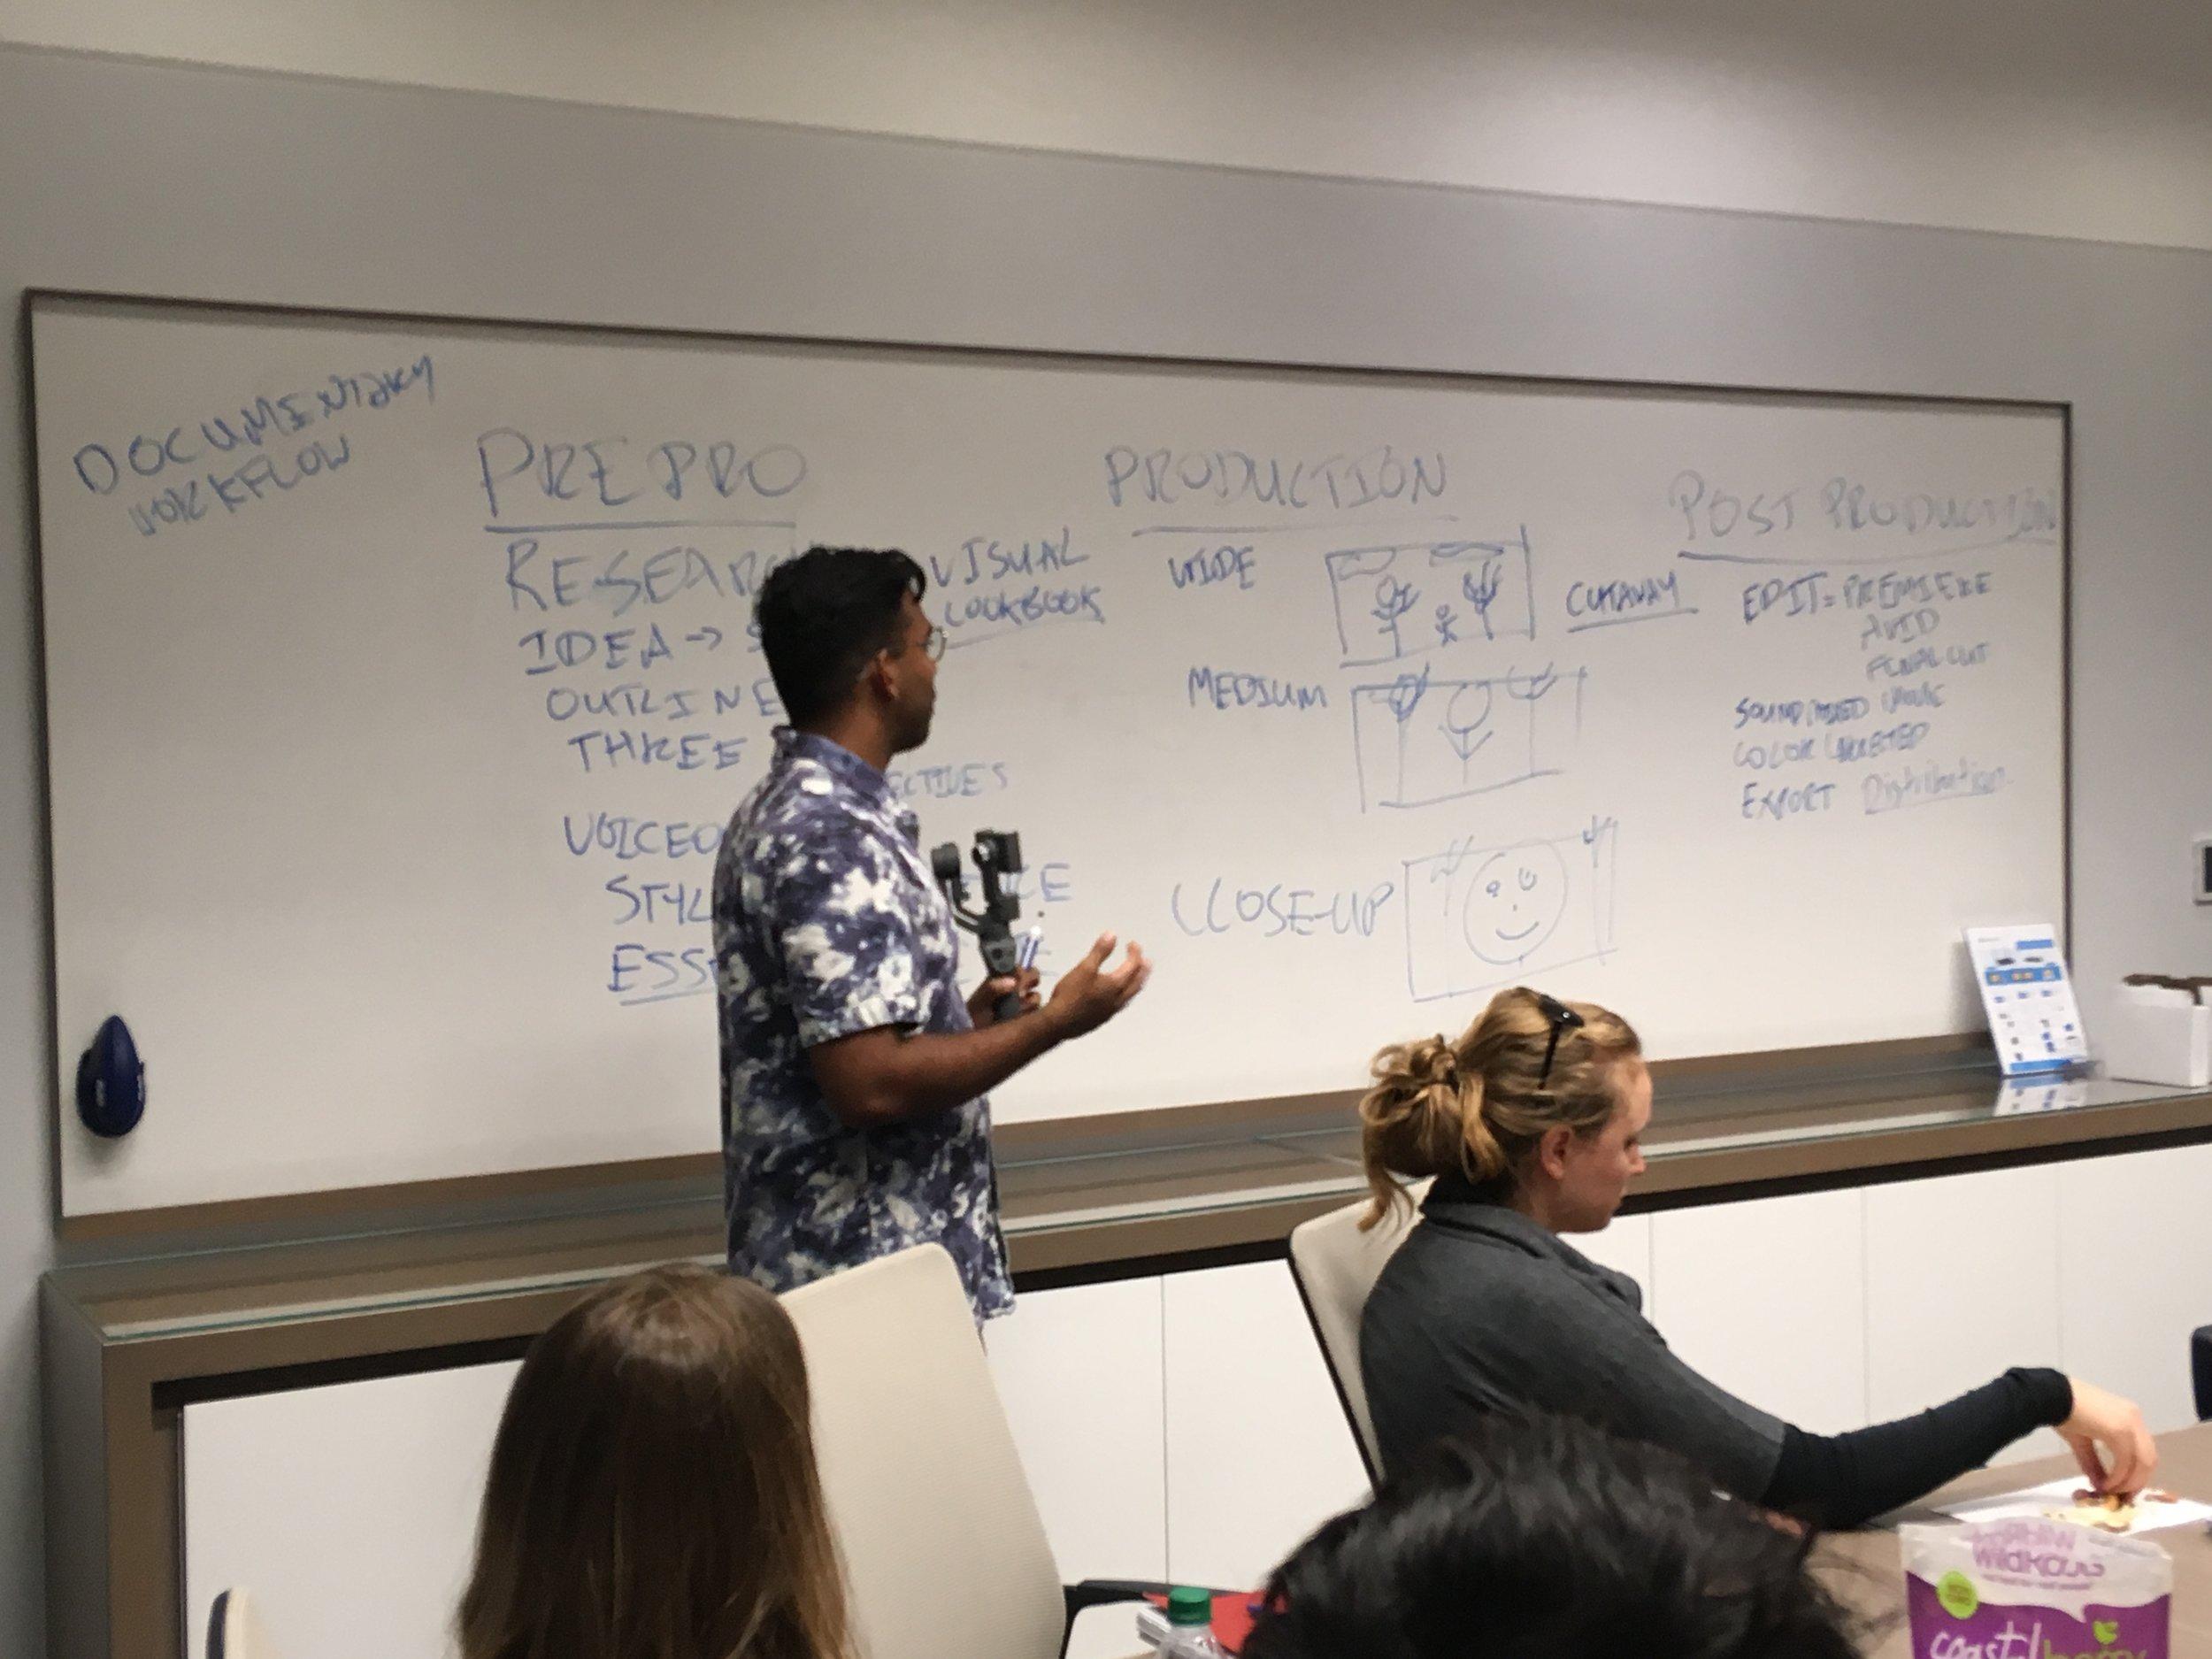 October 12, 2018: Mini-workshop on storytelling and production